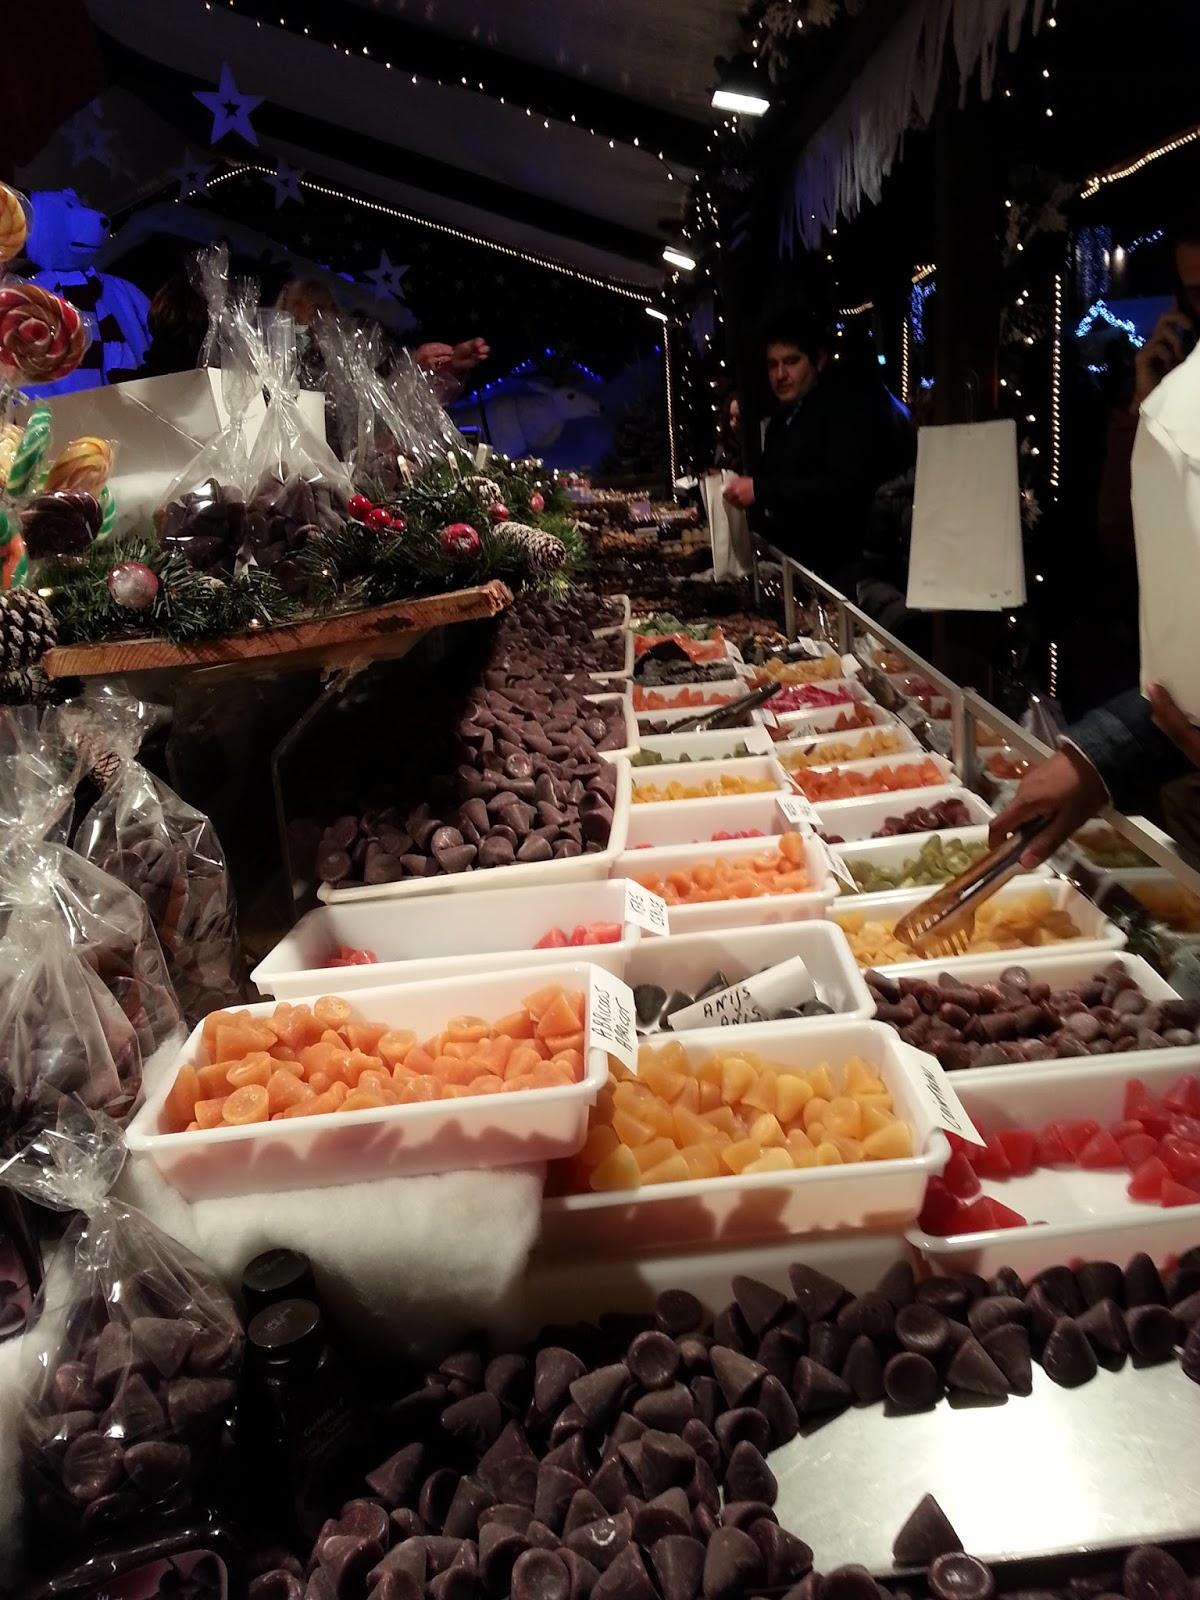 #A94422 Le Comptoir Des Filles: Marché De Noël à Bruxelles 5353 decorations de noel bruxelles 1200x1600 px @ aertt.com